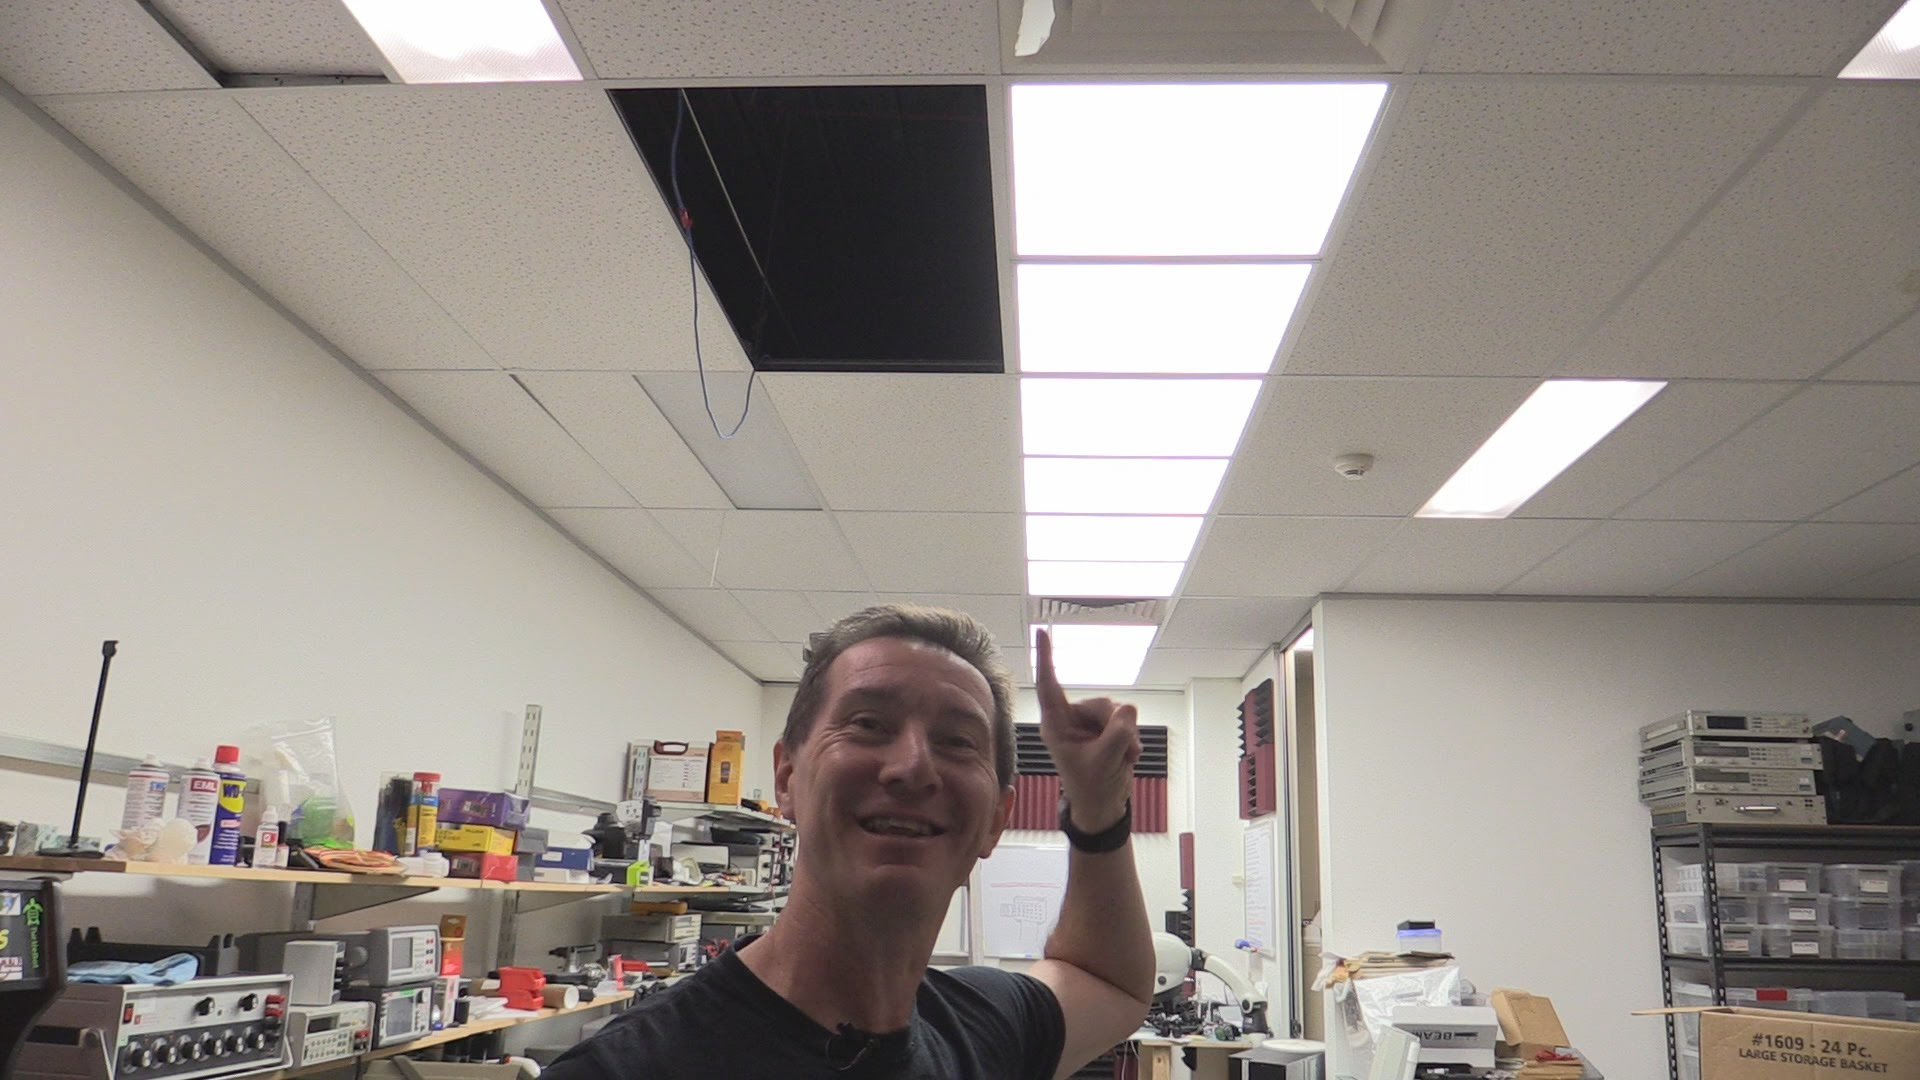 EEVblog #764 – New Lab Ceiling LED Lighting Installation